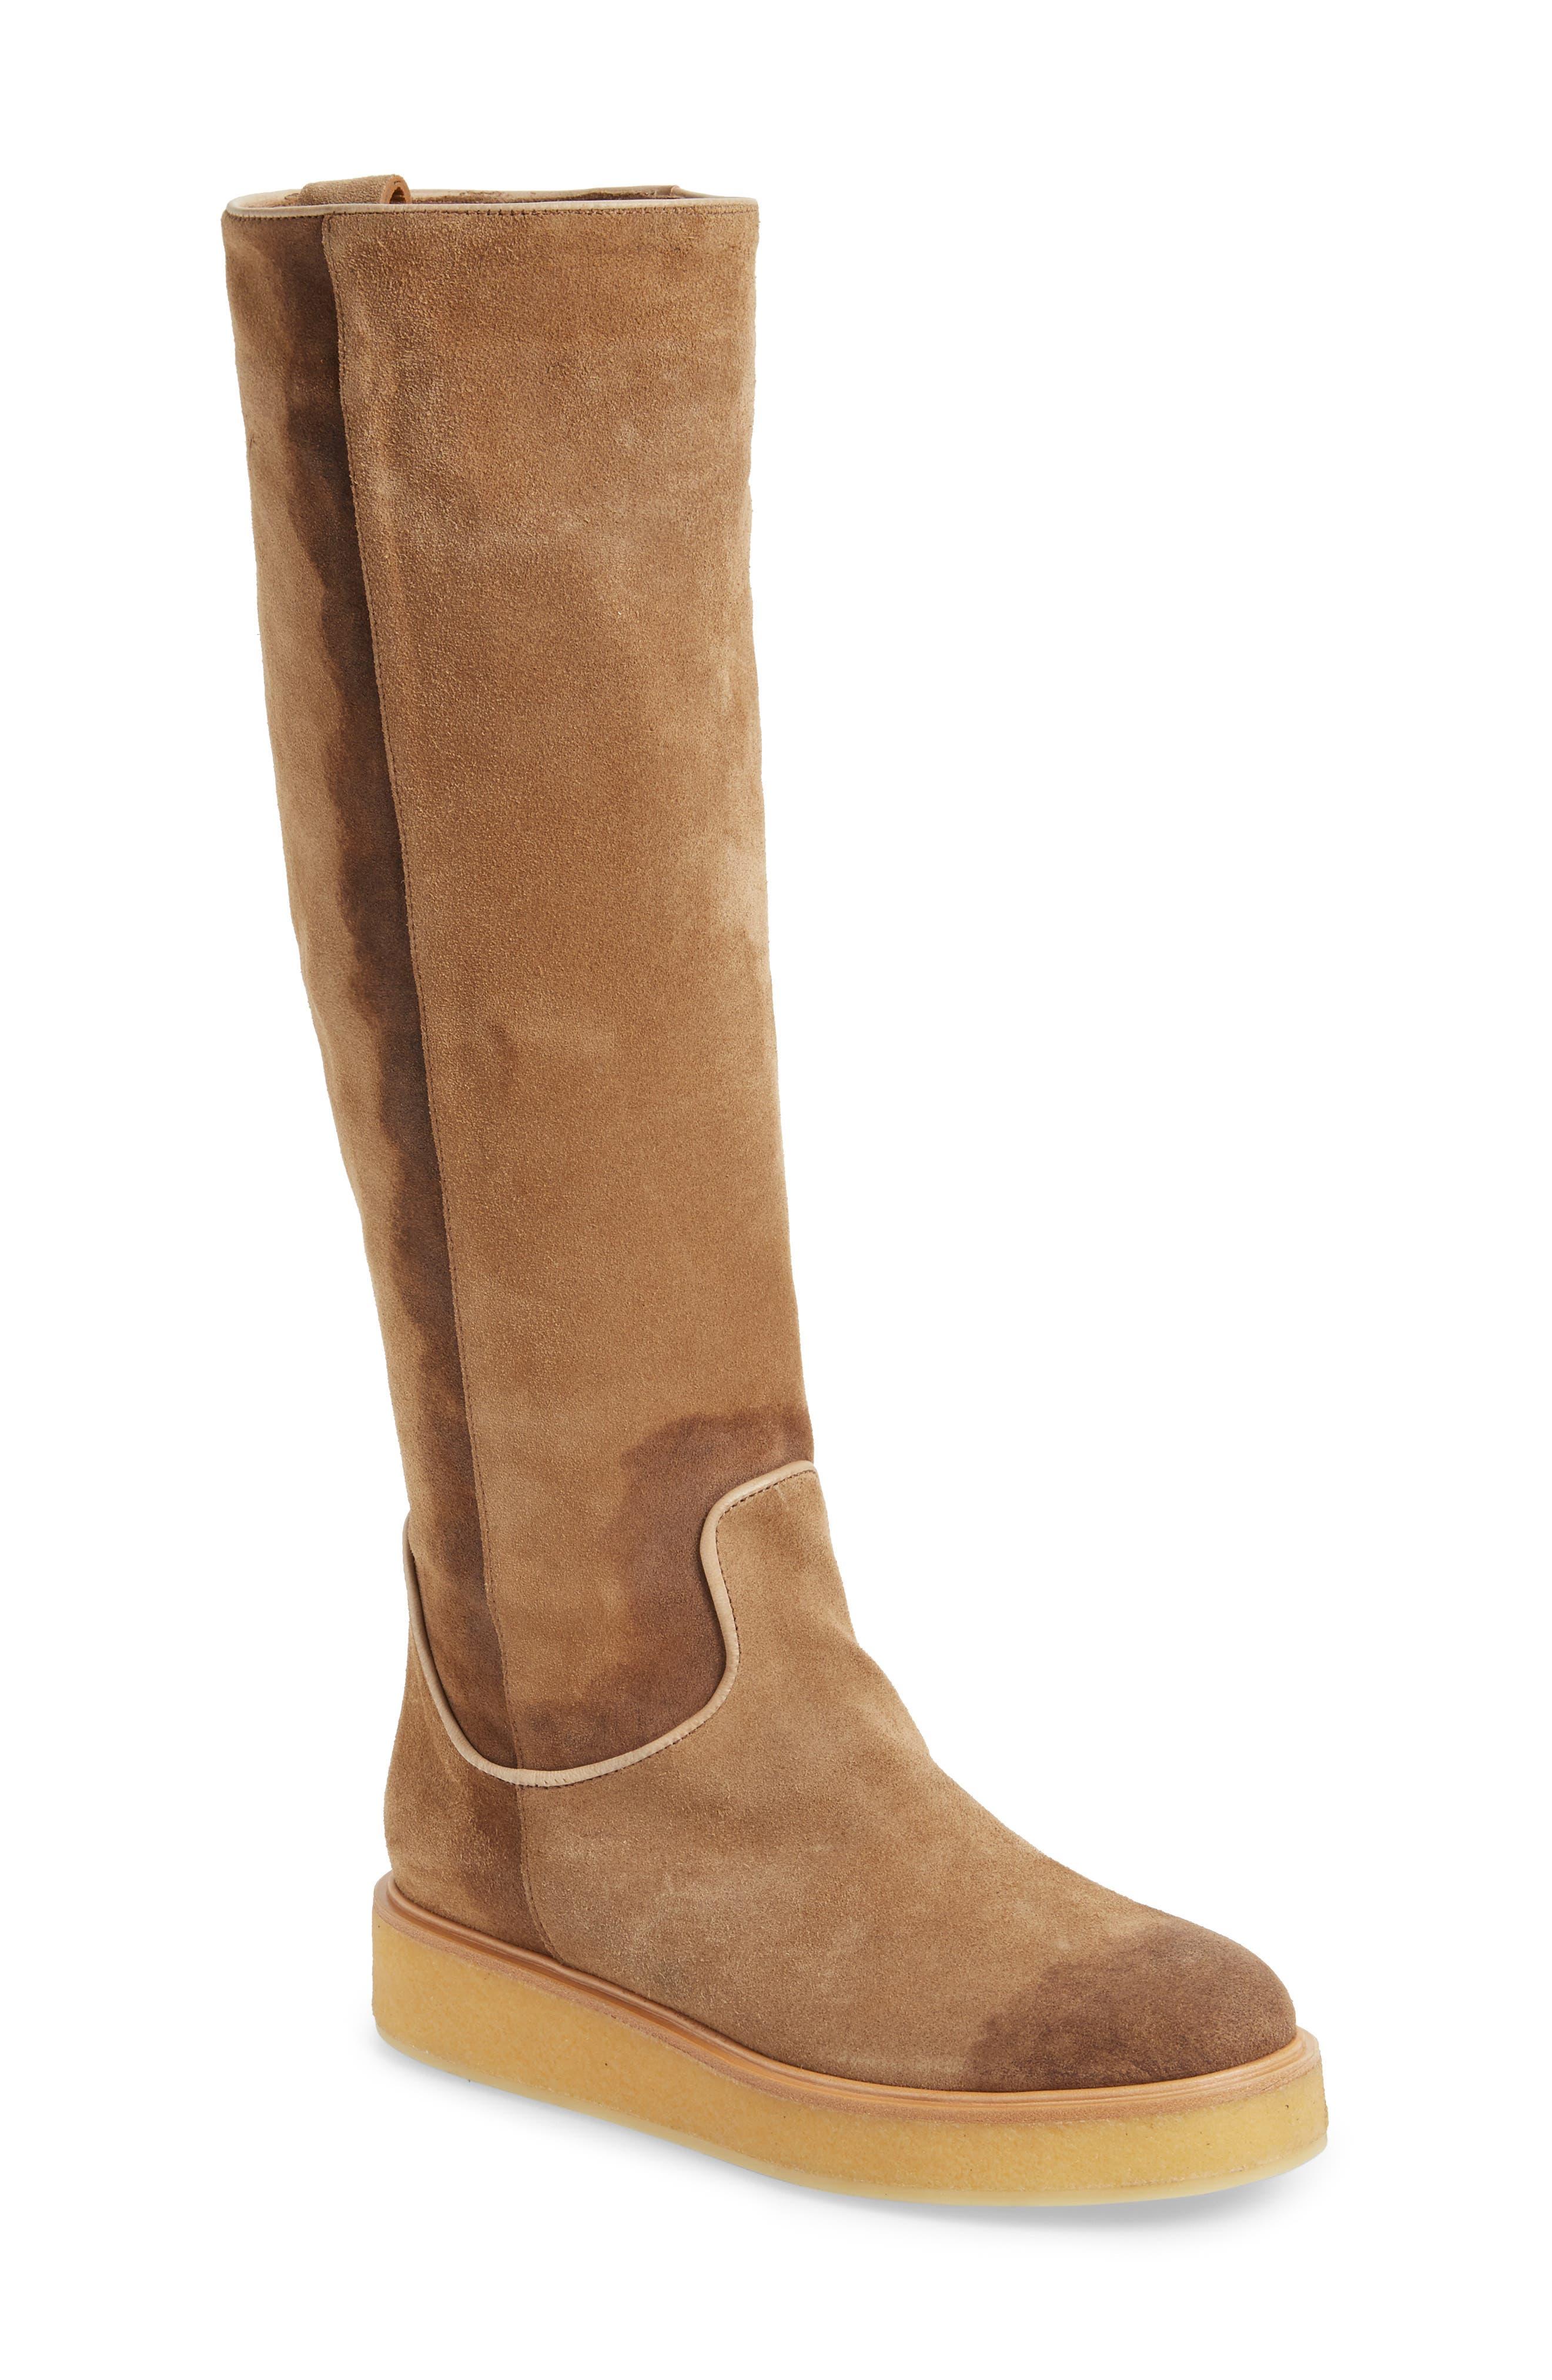 Alternate Image 1 Selected - Alberto Fermani Nerola Knee High Boot (Women)